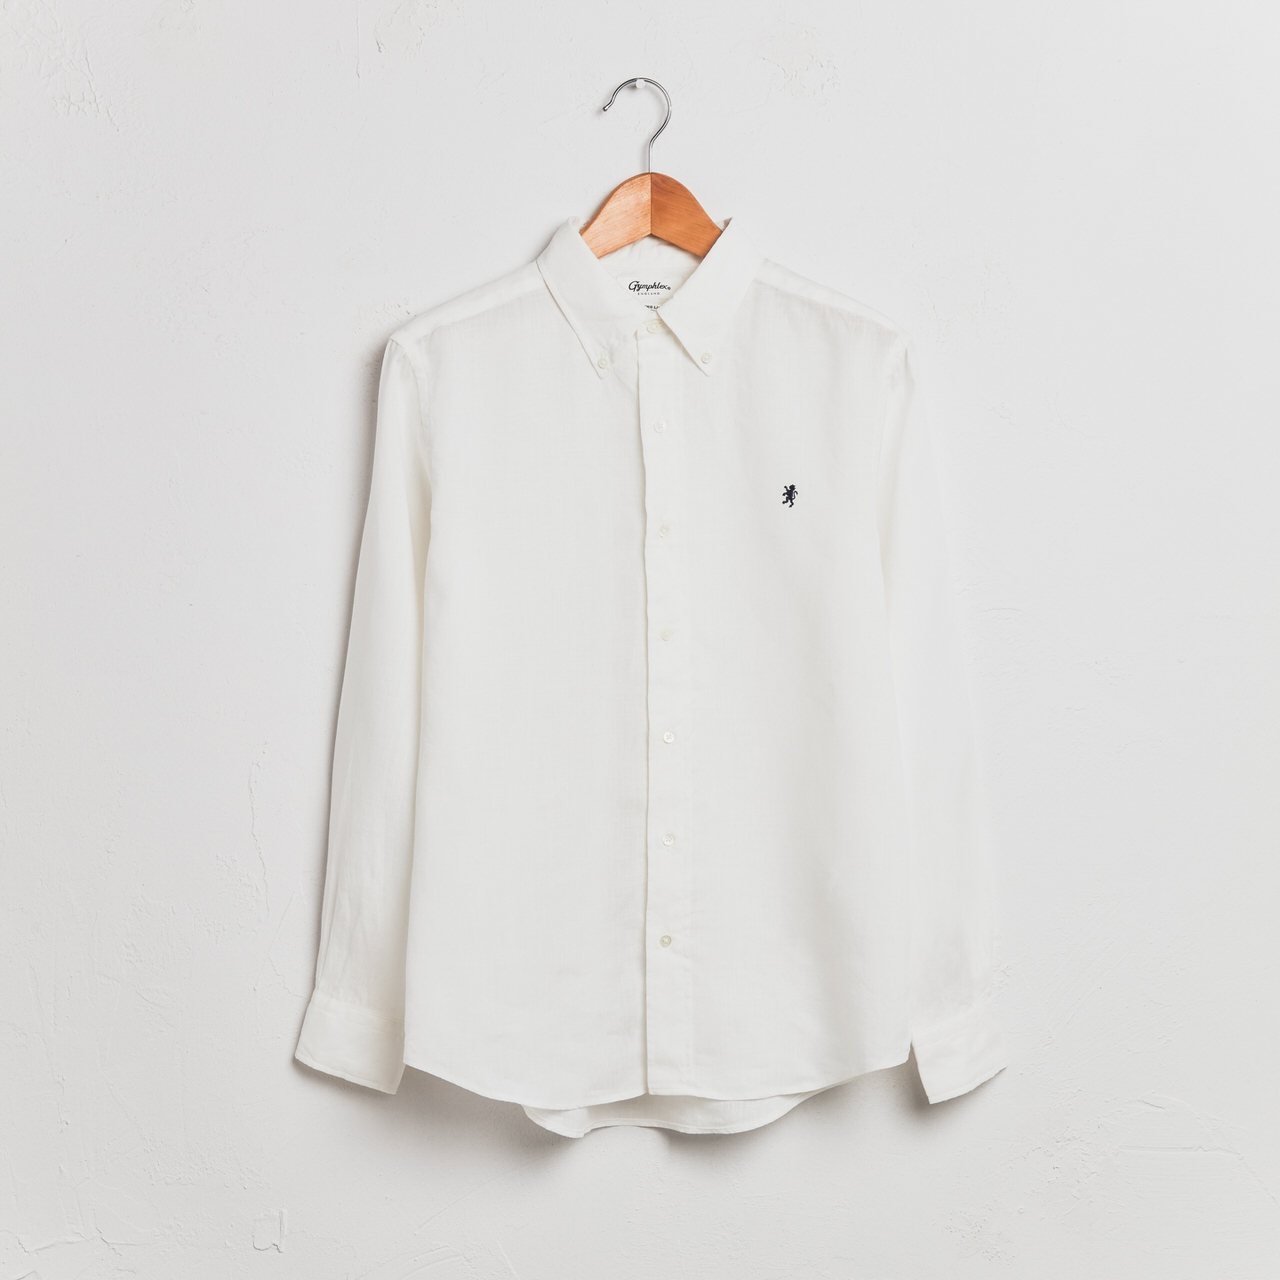 811943eda Humberstone Shirt - White • Gymphlex • Beautiful, practical clothing ...